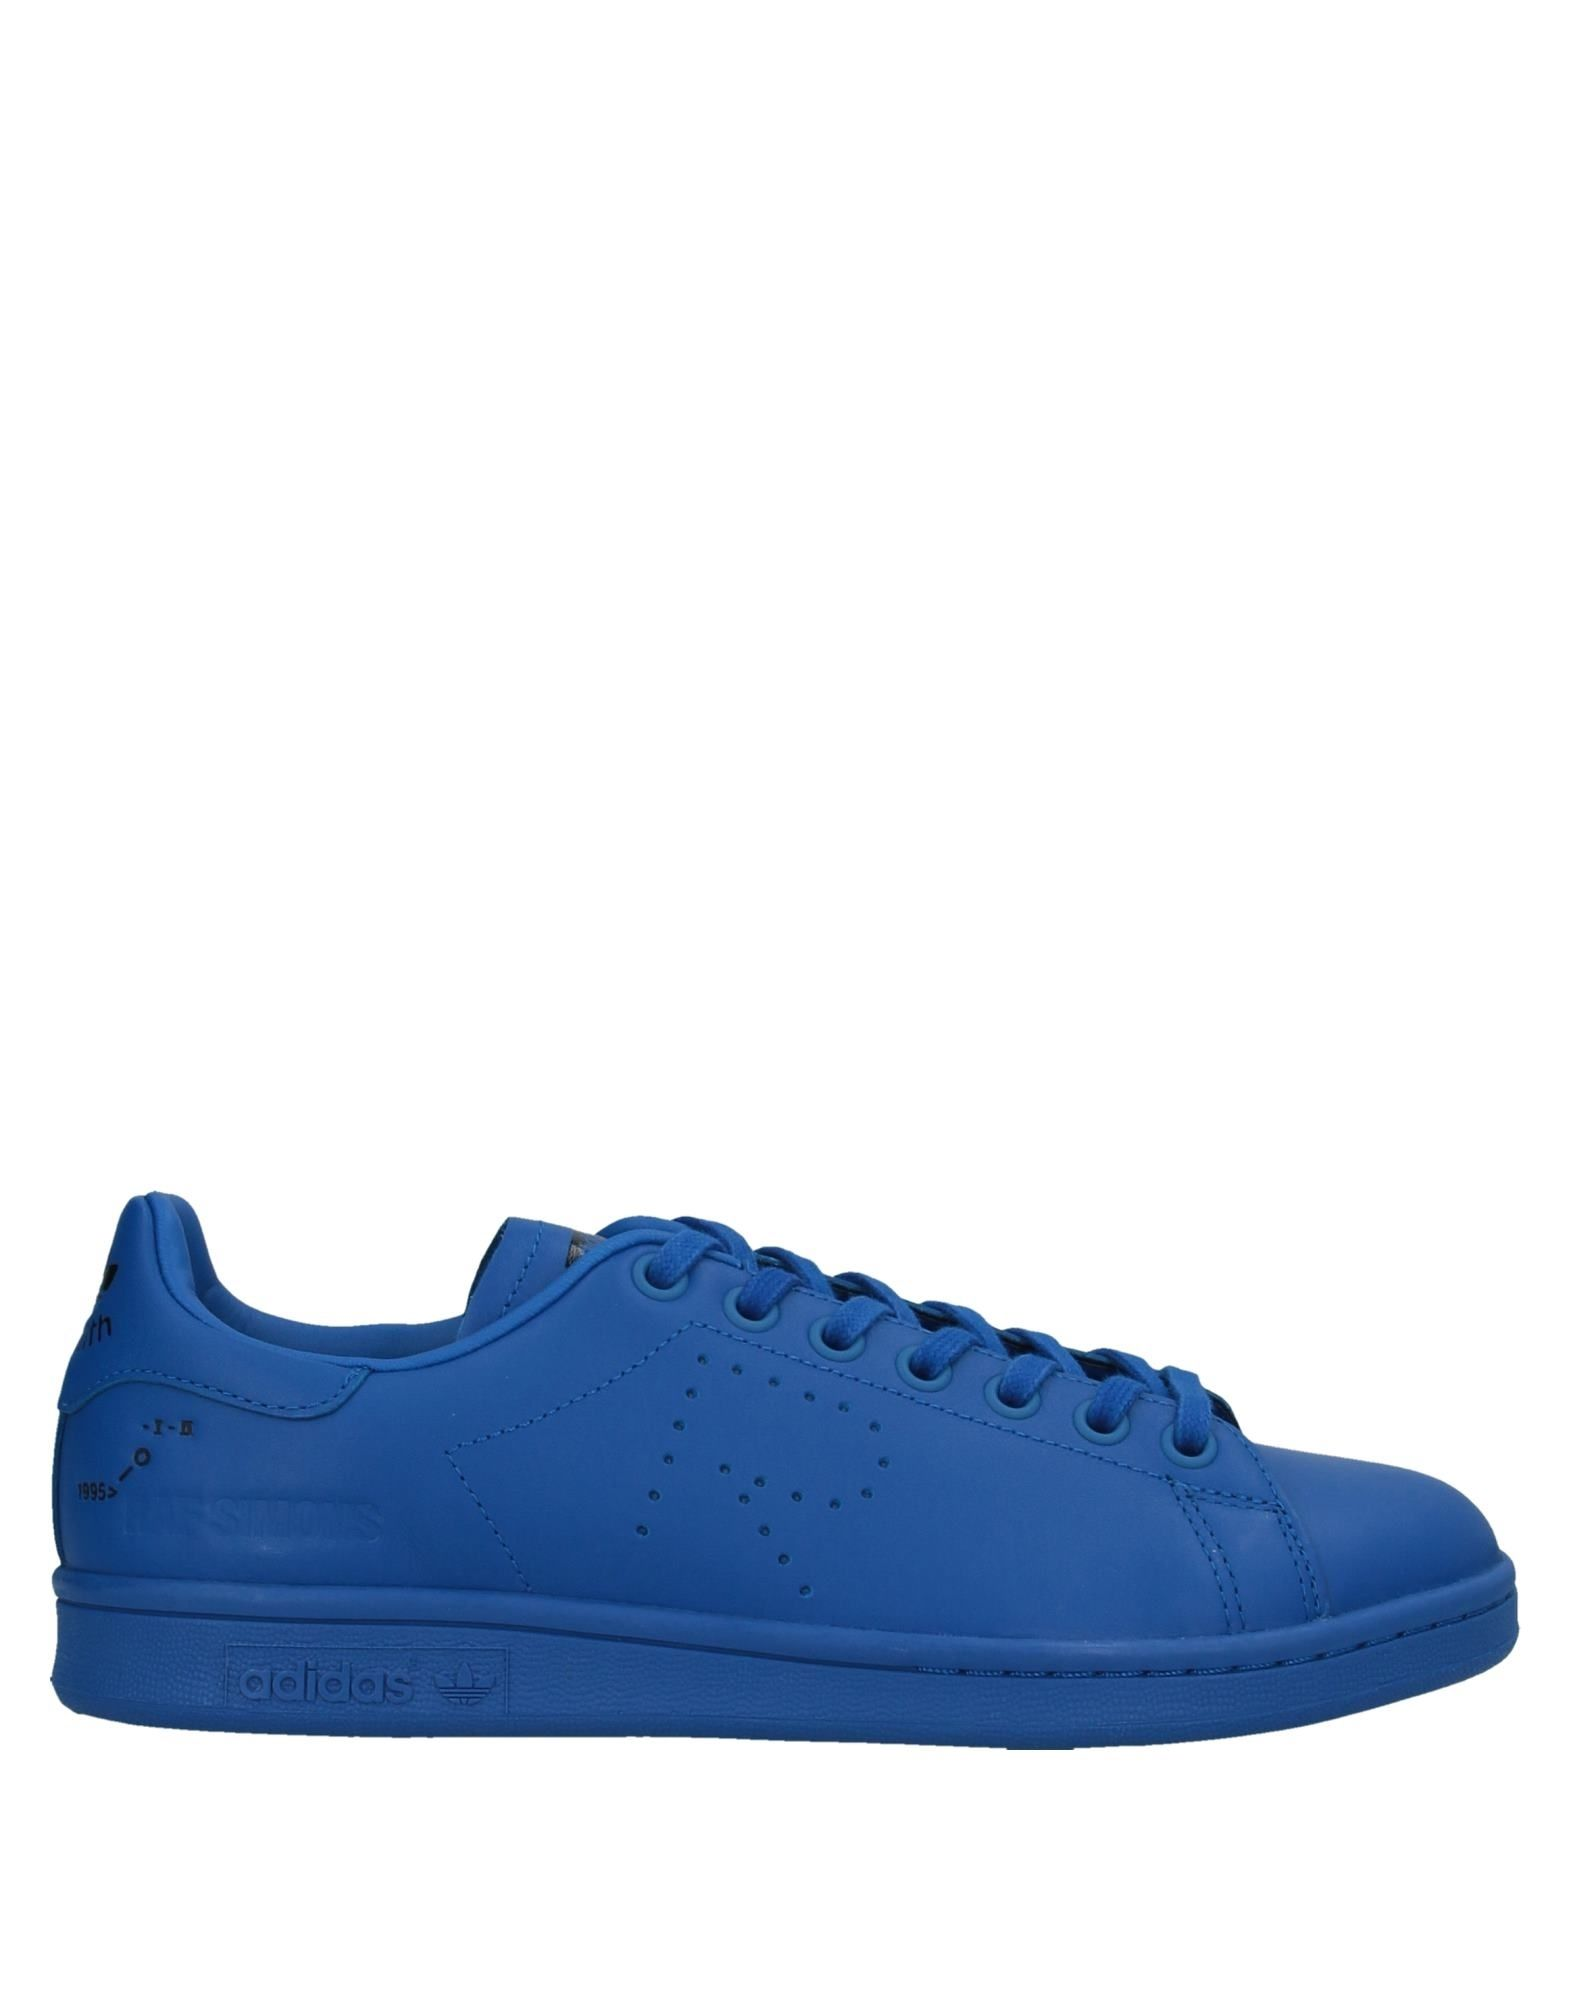 Turnscarpe Adidas By Raf Simons uomo - - 11704826DC  Willkommen zu kaufen